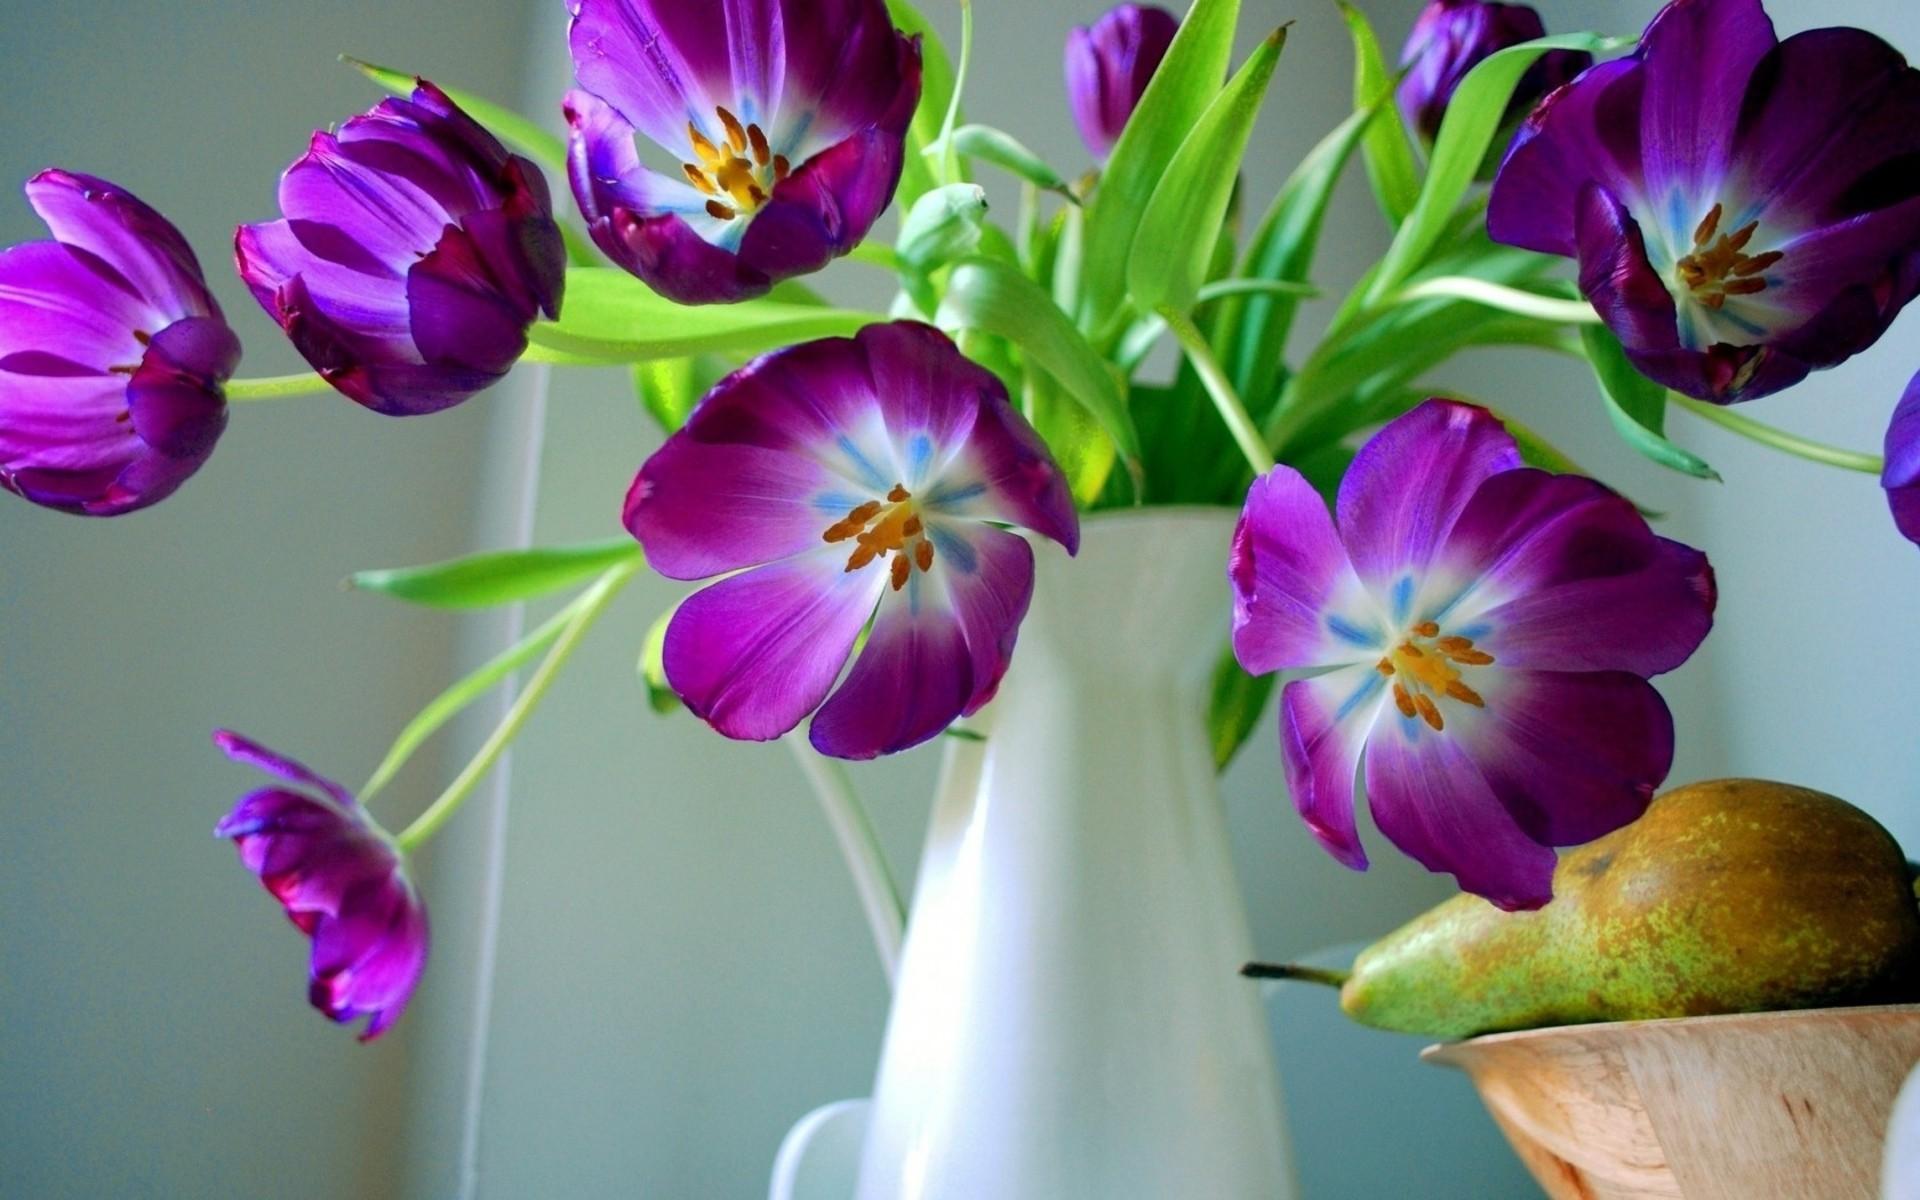 , Amazing, Still,beautiful Flower Wallpapers, Love, - Mobile Wallpaper Of Beautiful Flower - HD Wallpaper